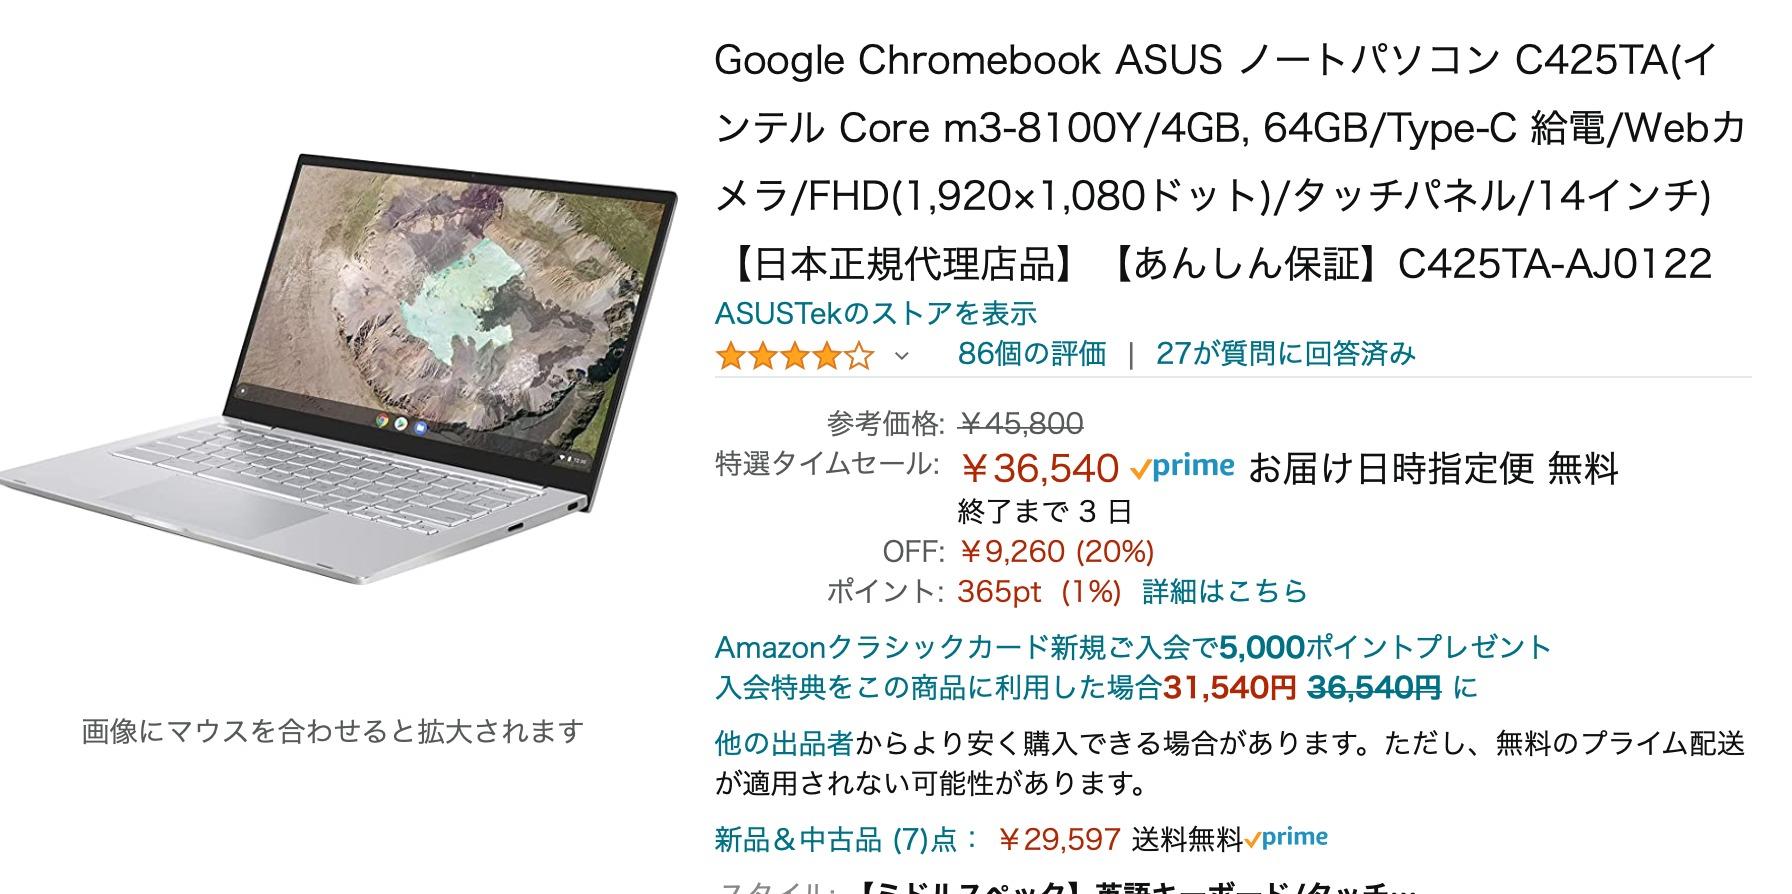 ASUS Chromebook C425TA